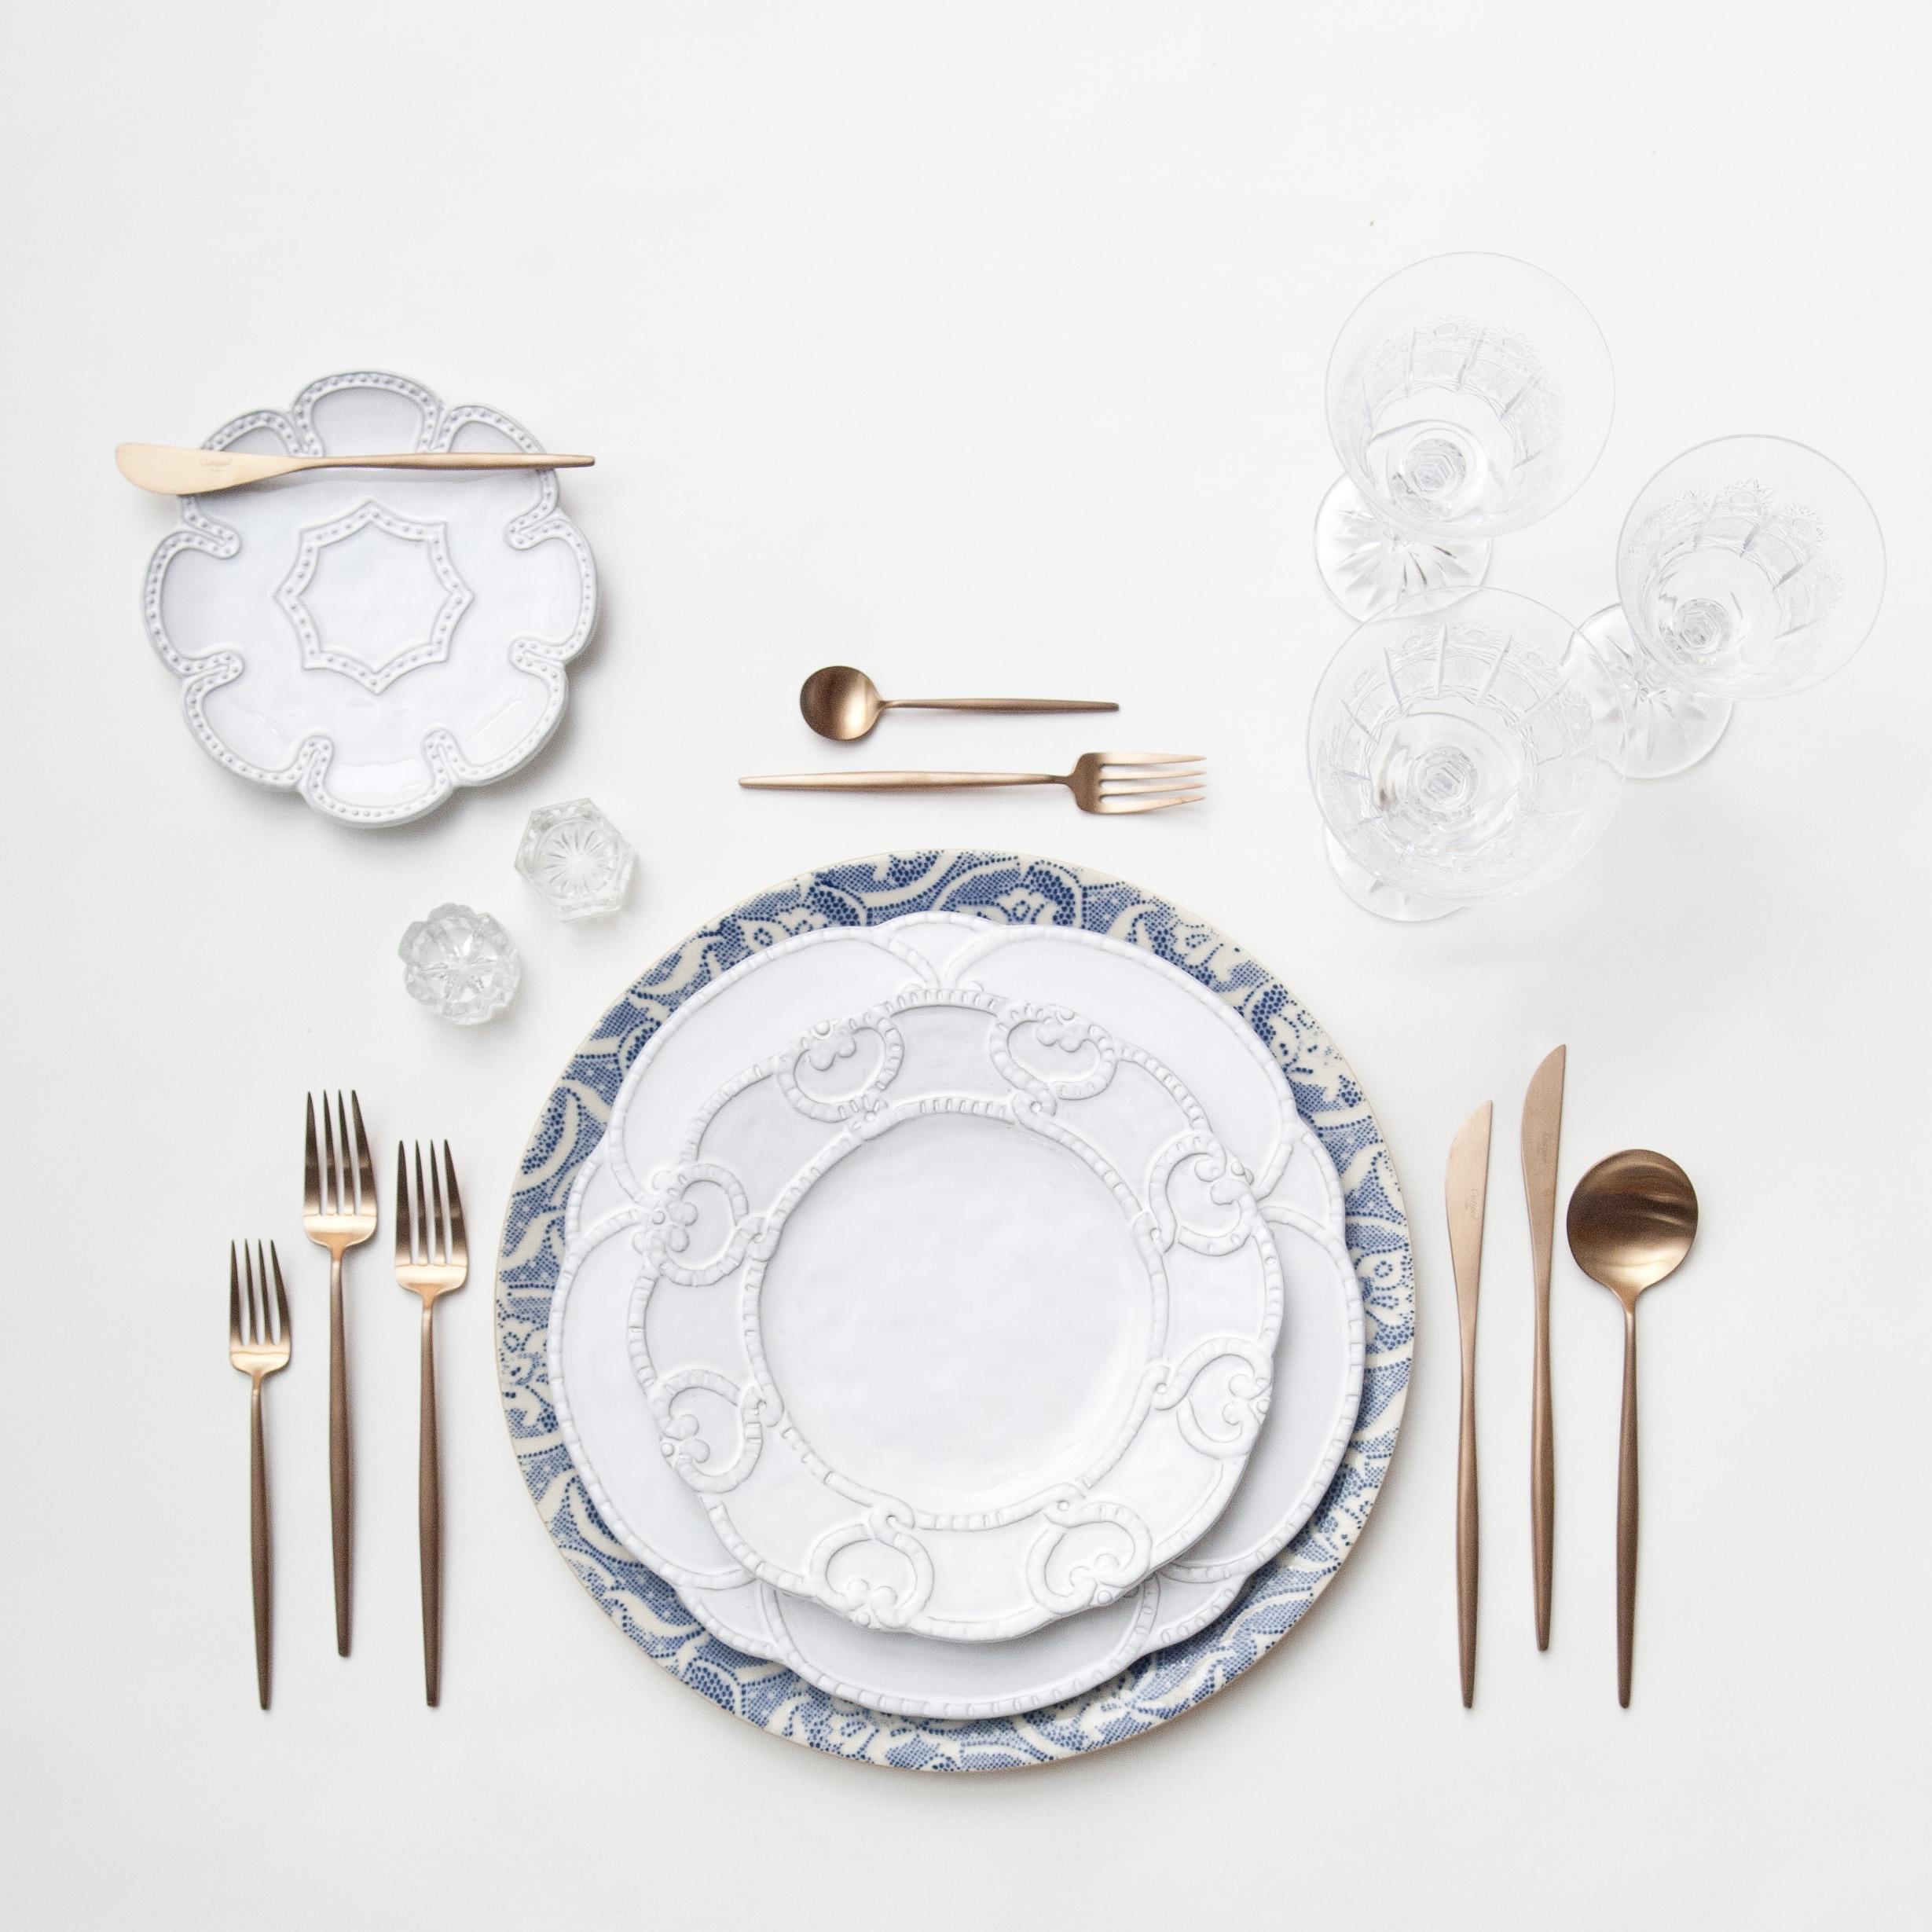 RENT: Blue Fleur de Lis Chargers + Signature Collection Dinnerware + Moon Flatware in Brushed Rose Gold + Czech Crystal Stemware + Antique Crystal Salt Cellars  SHOP:Moon Flatware in Brushed Rose Gold